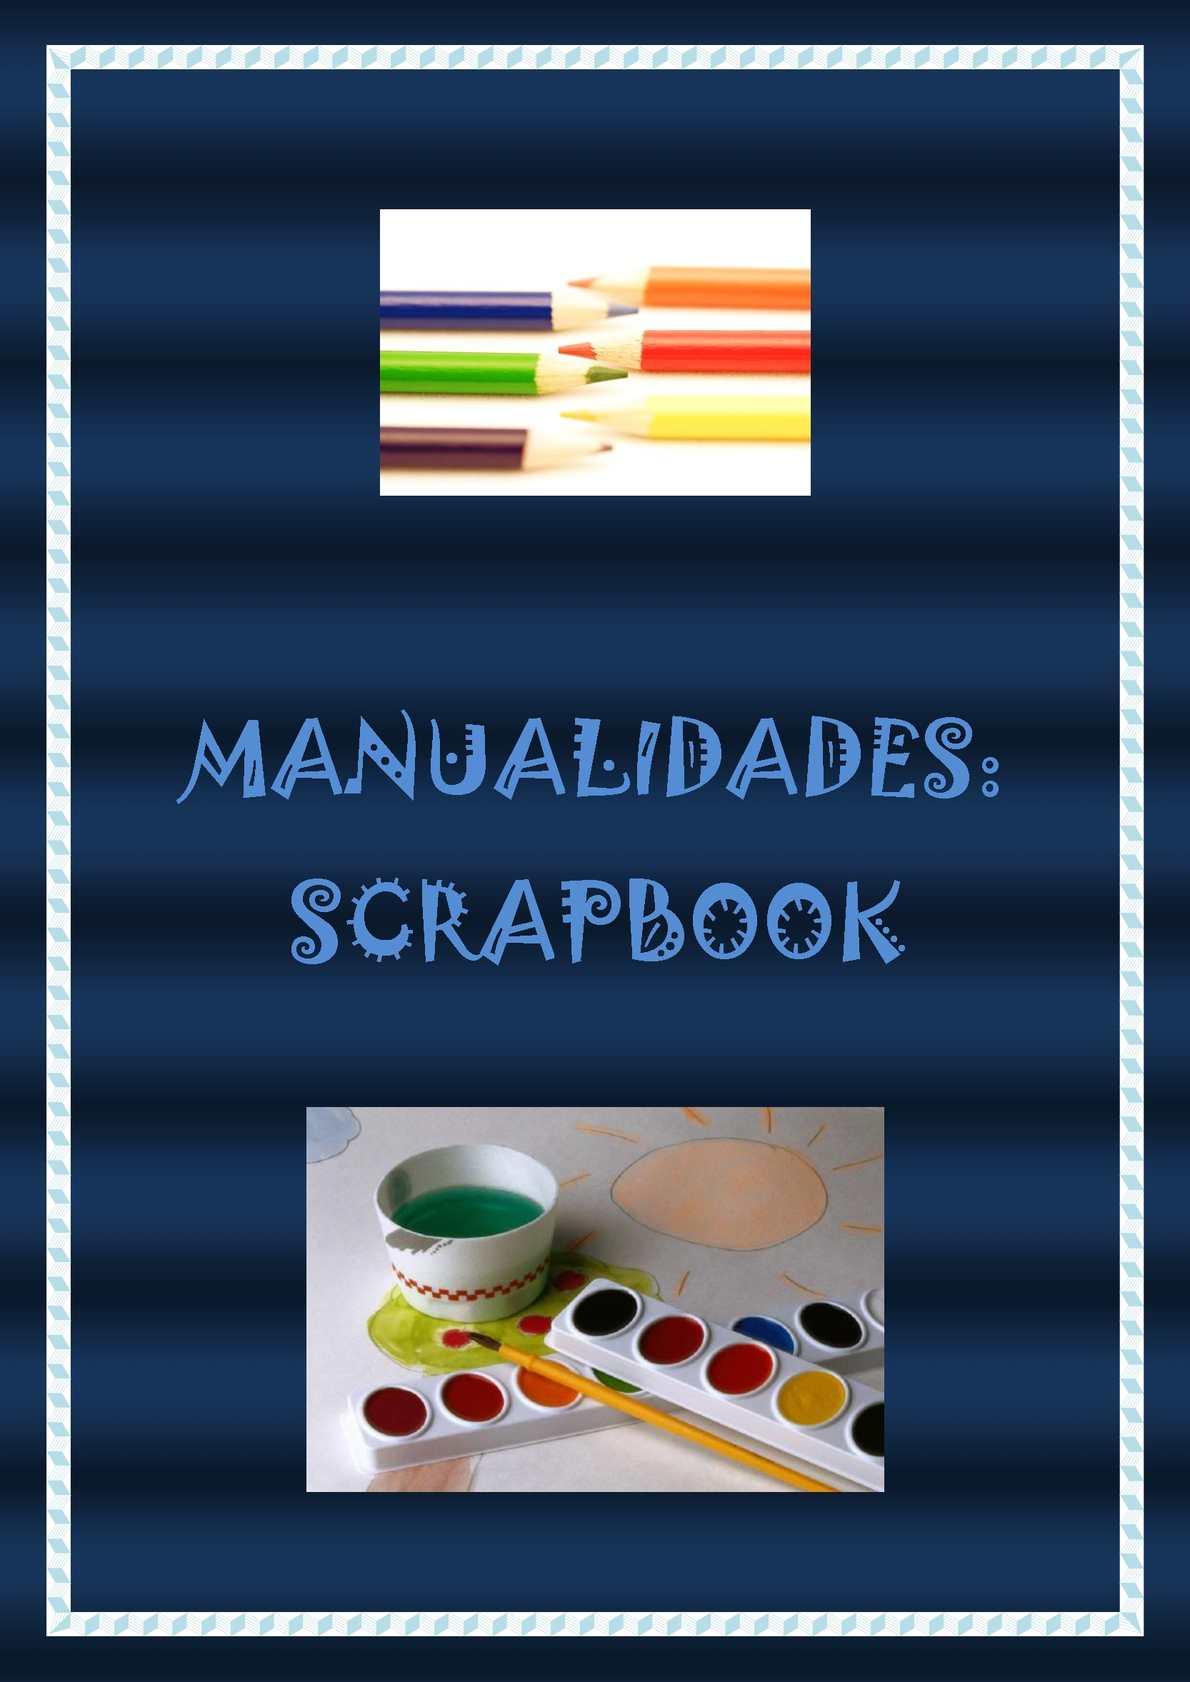 MANUALIDADES: SCRAPBOOK